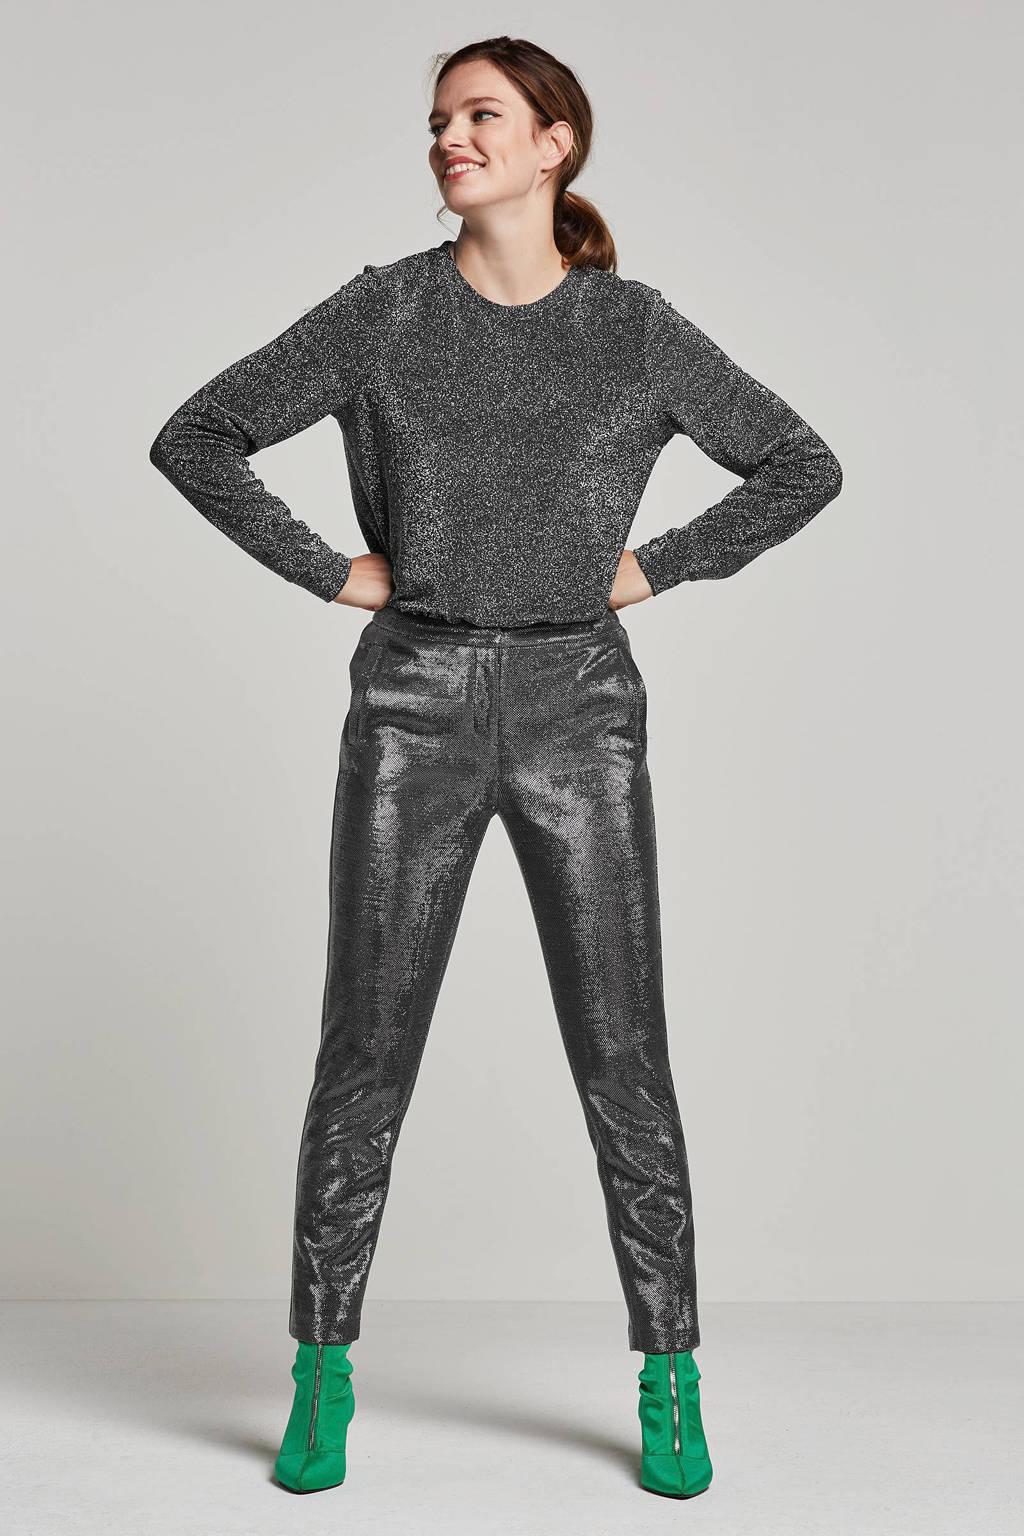 VERO MODA glitter top, Zilver/zwart